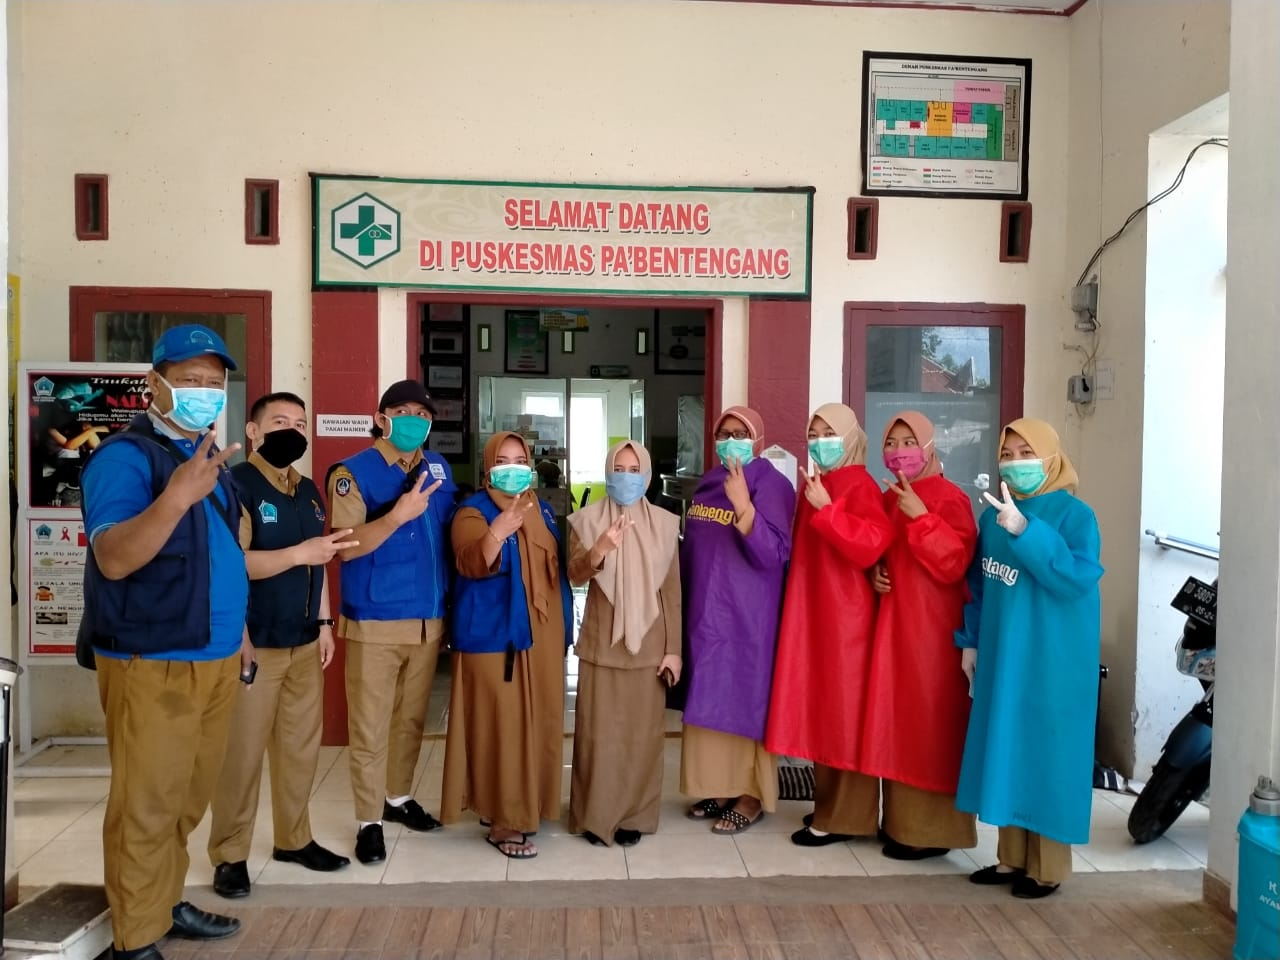 Peringati Hari Keluarga Nasional, Pelayanan KB Gratis dilaksanakan di Kecamatan Eremerasa Bantaeng